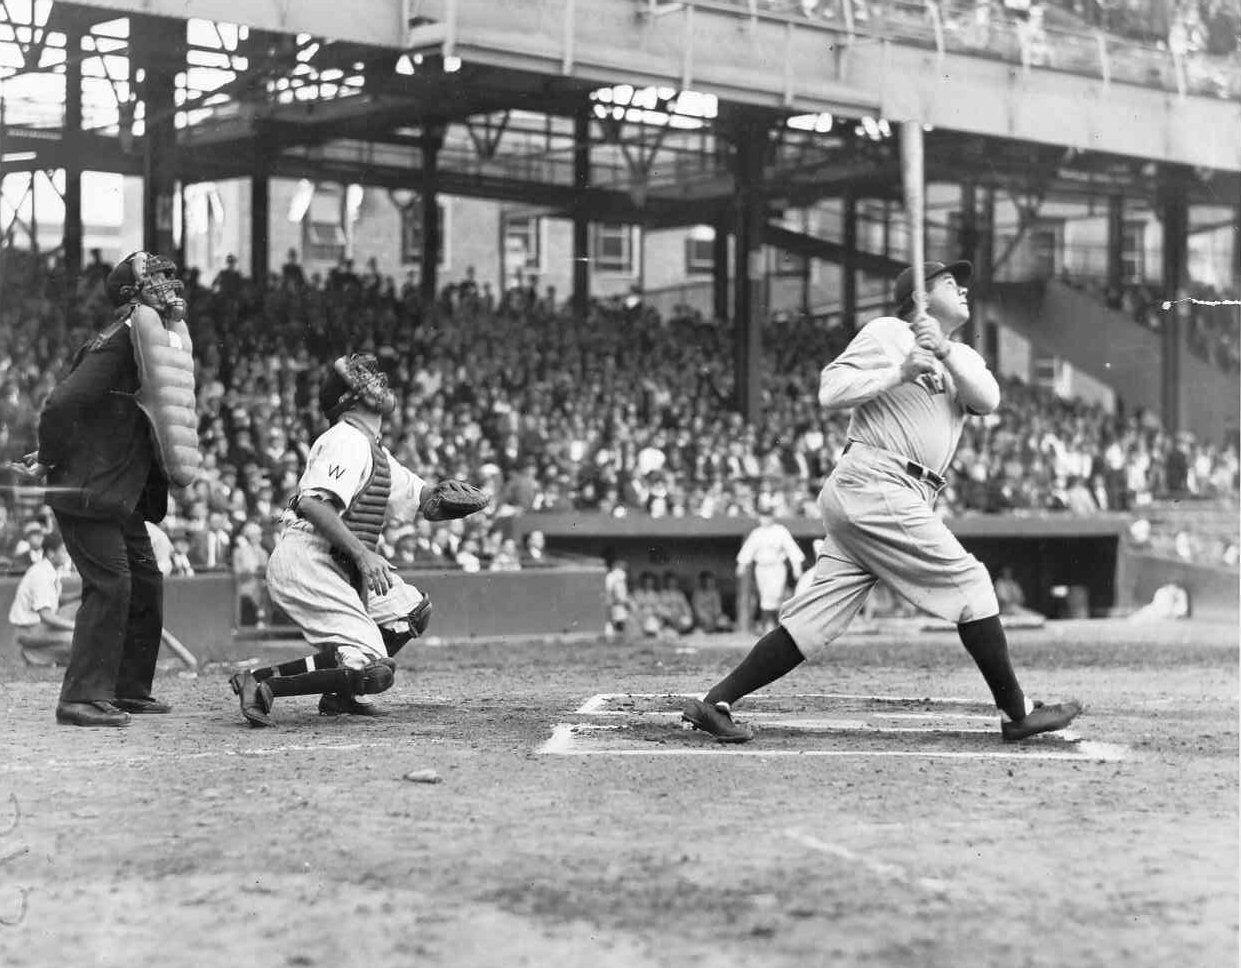 Baseball-mlb Best Babe Ruth Hits 500th Home Run New York Yankees Mlb Baseball 1929 Newspaper We Take Customers As Our Gods Sports Mem, Cards & Fan Shop